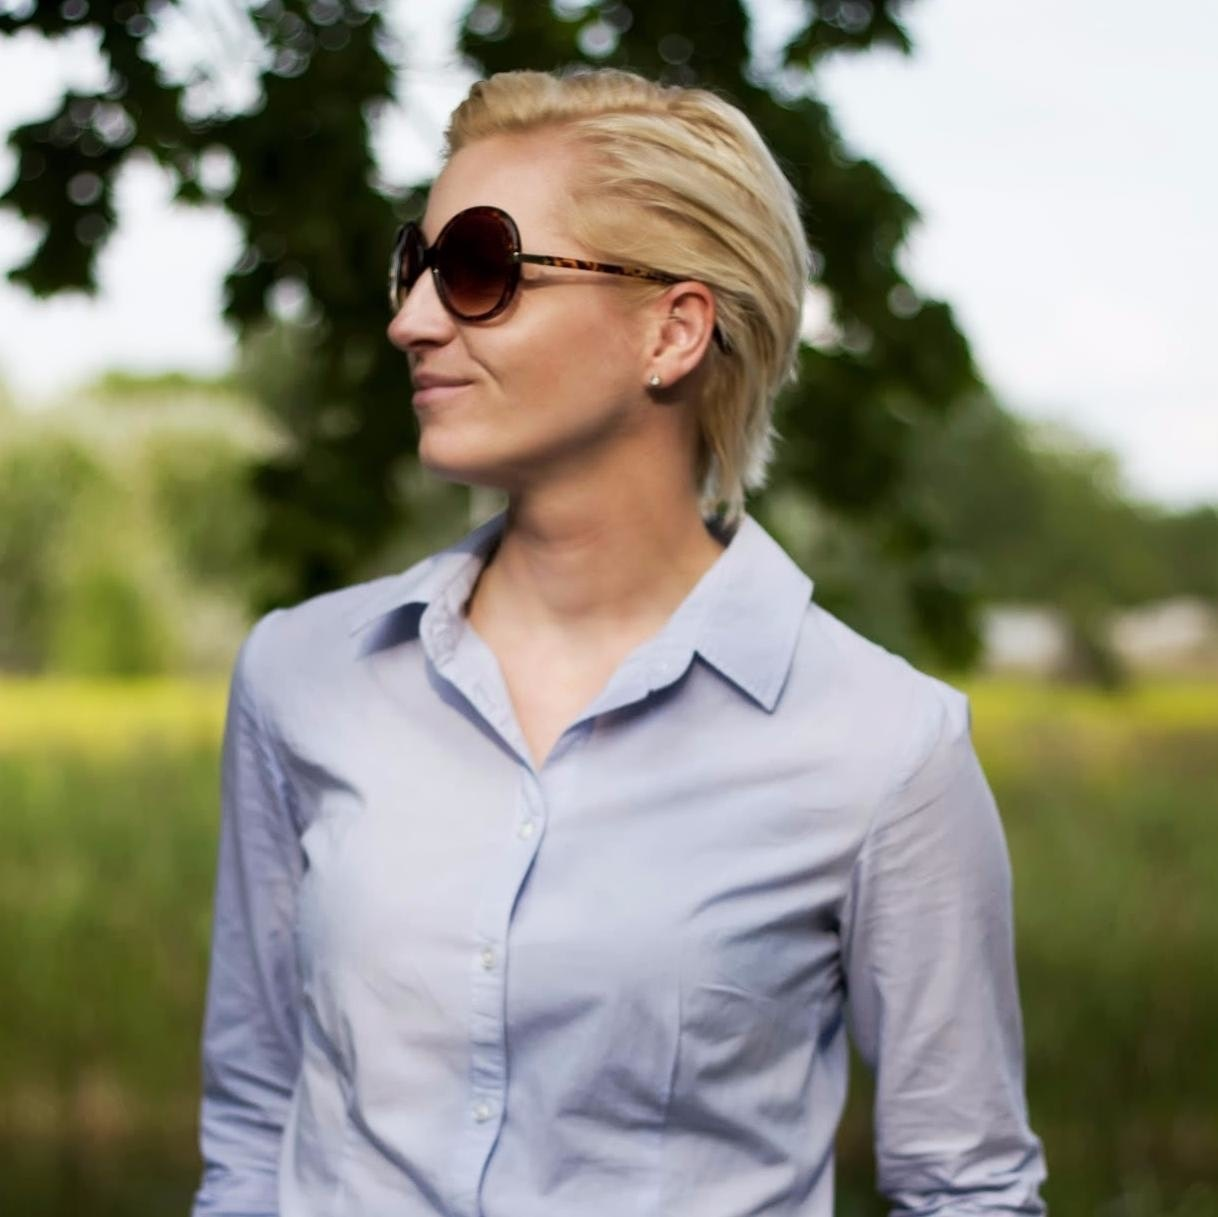 Marta Dobrzanska